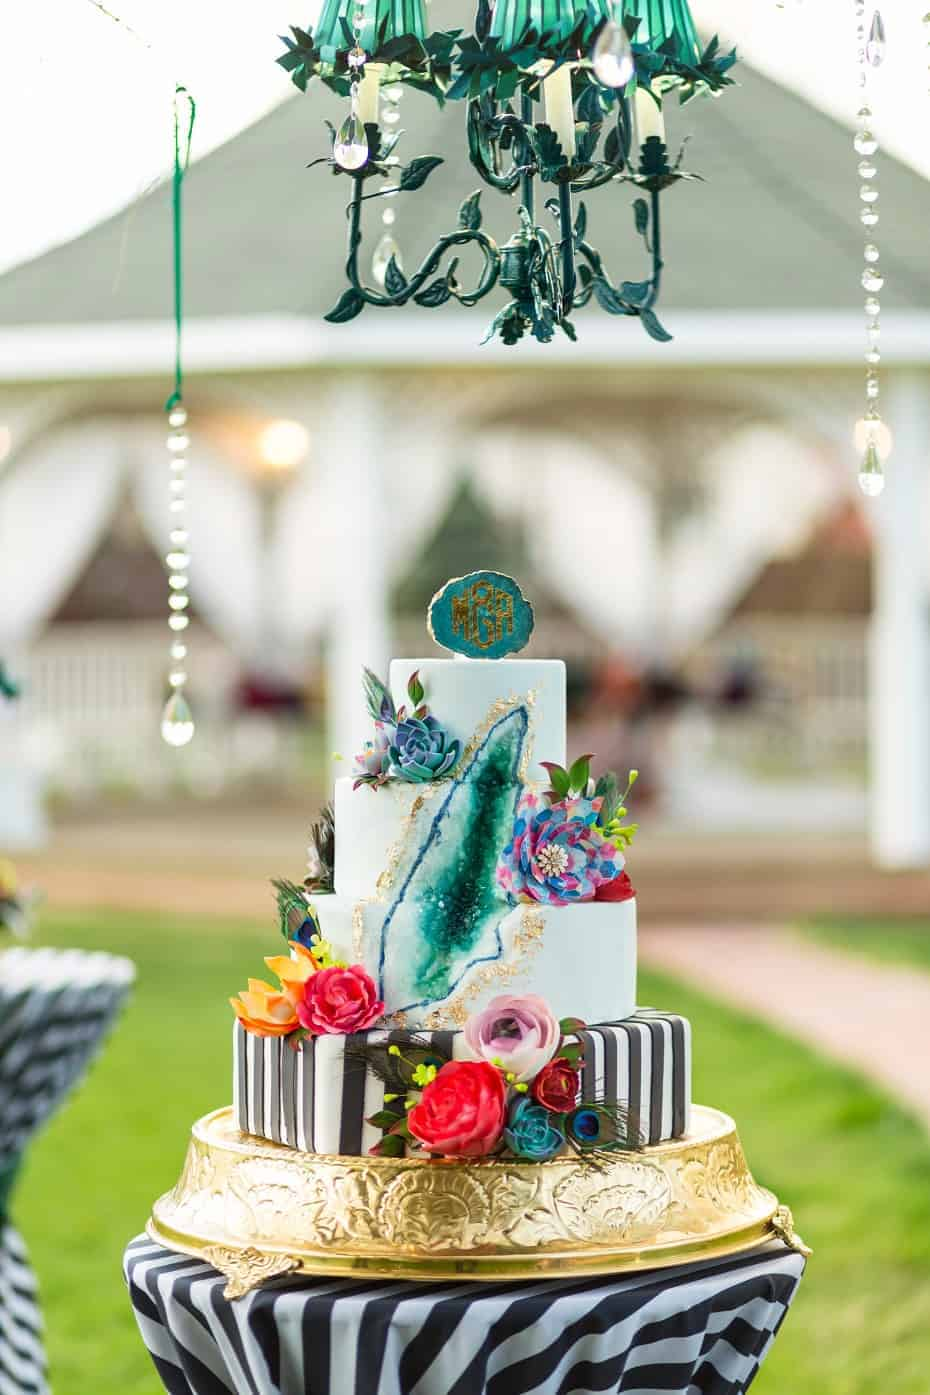 The Makery Cake Company Bohemian Themed Geode Cake